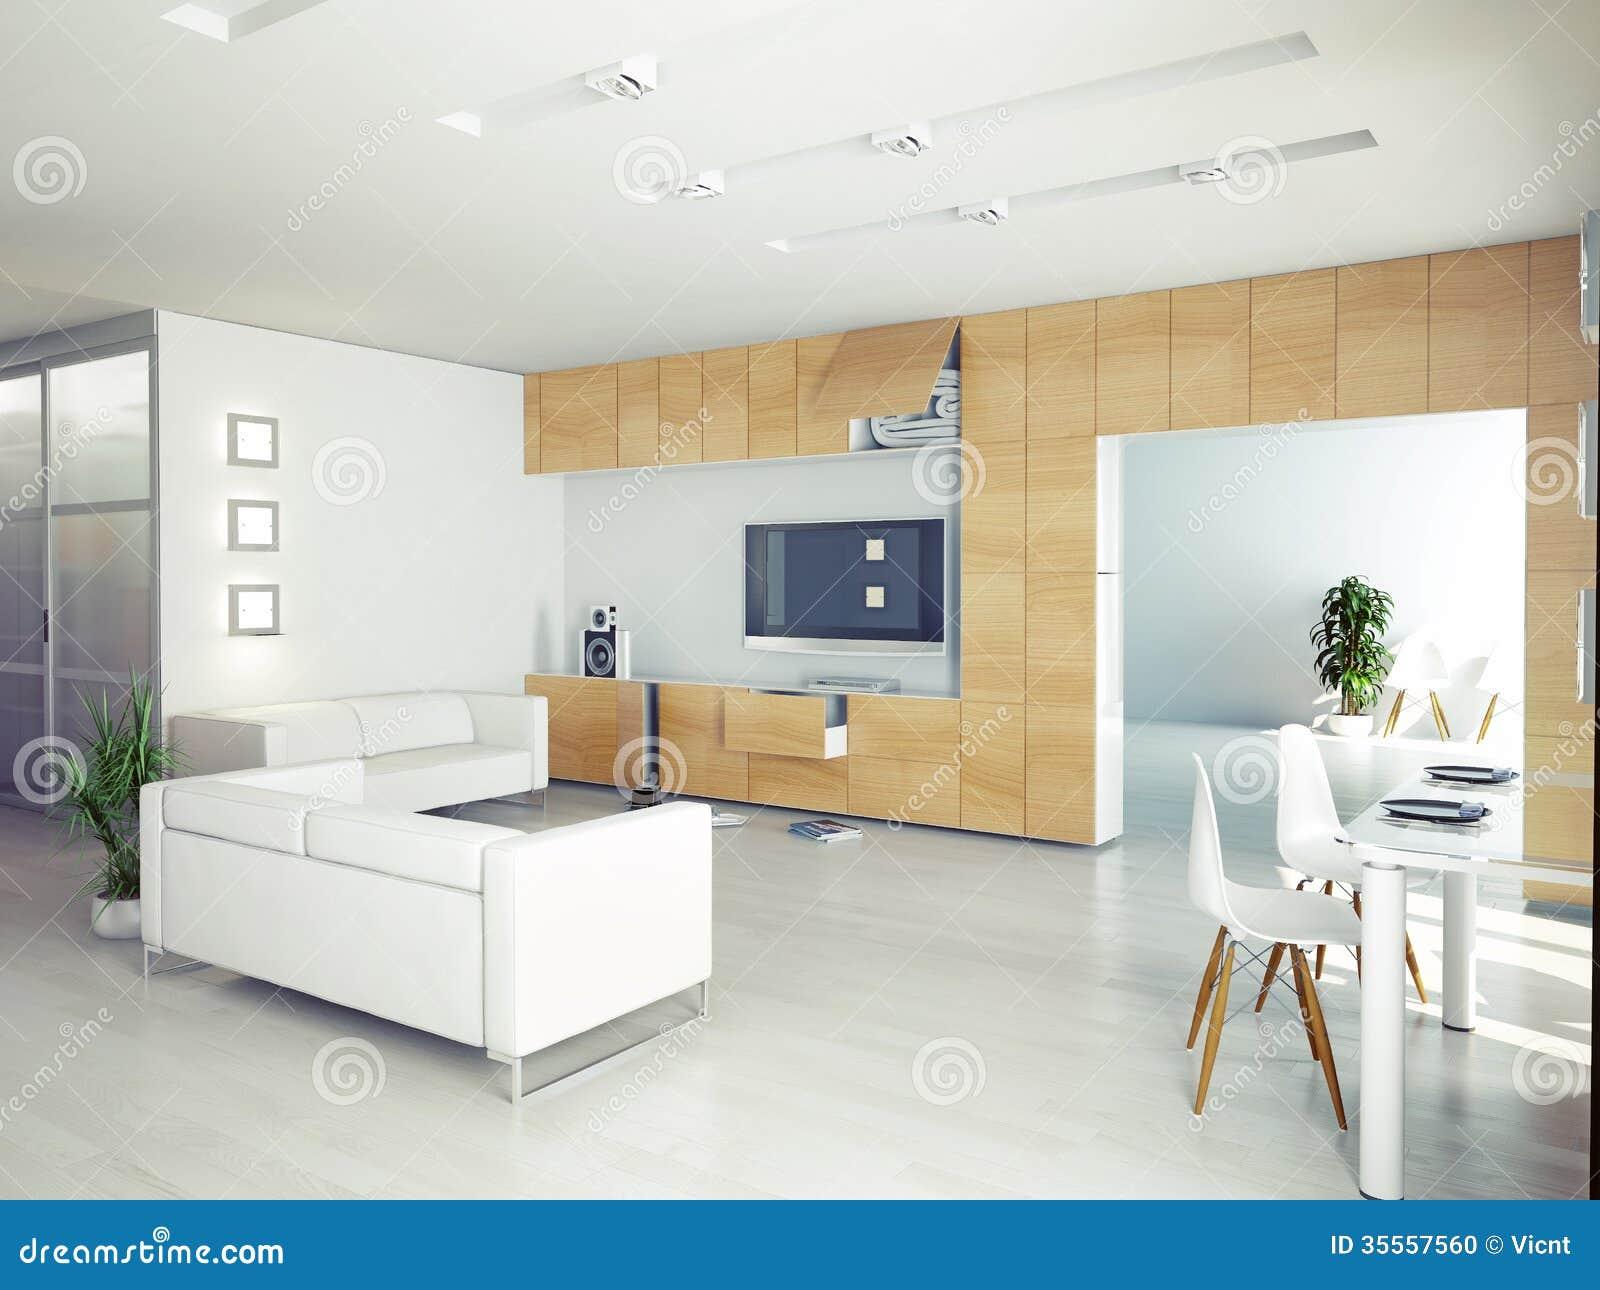 Living Room Interior Stock Photo Image 35557560